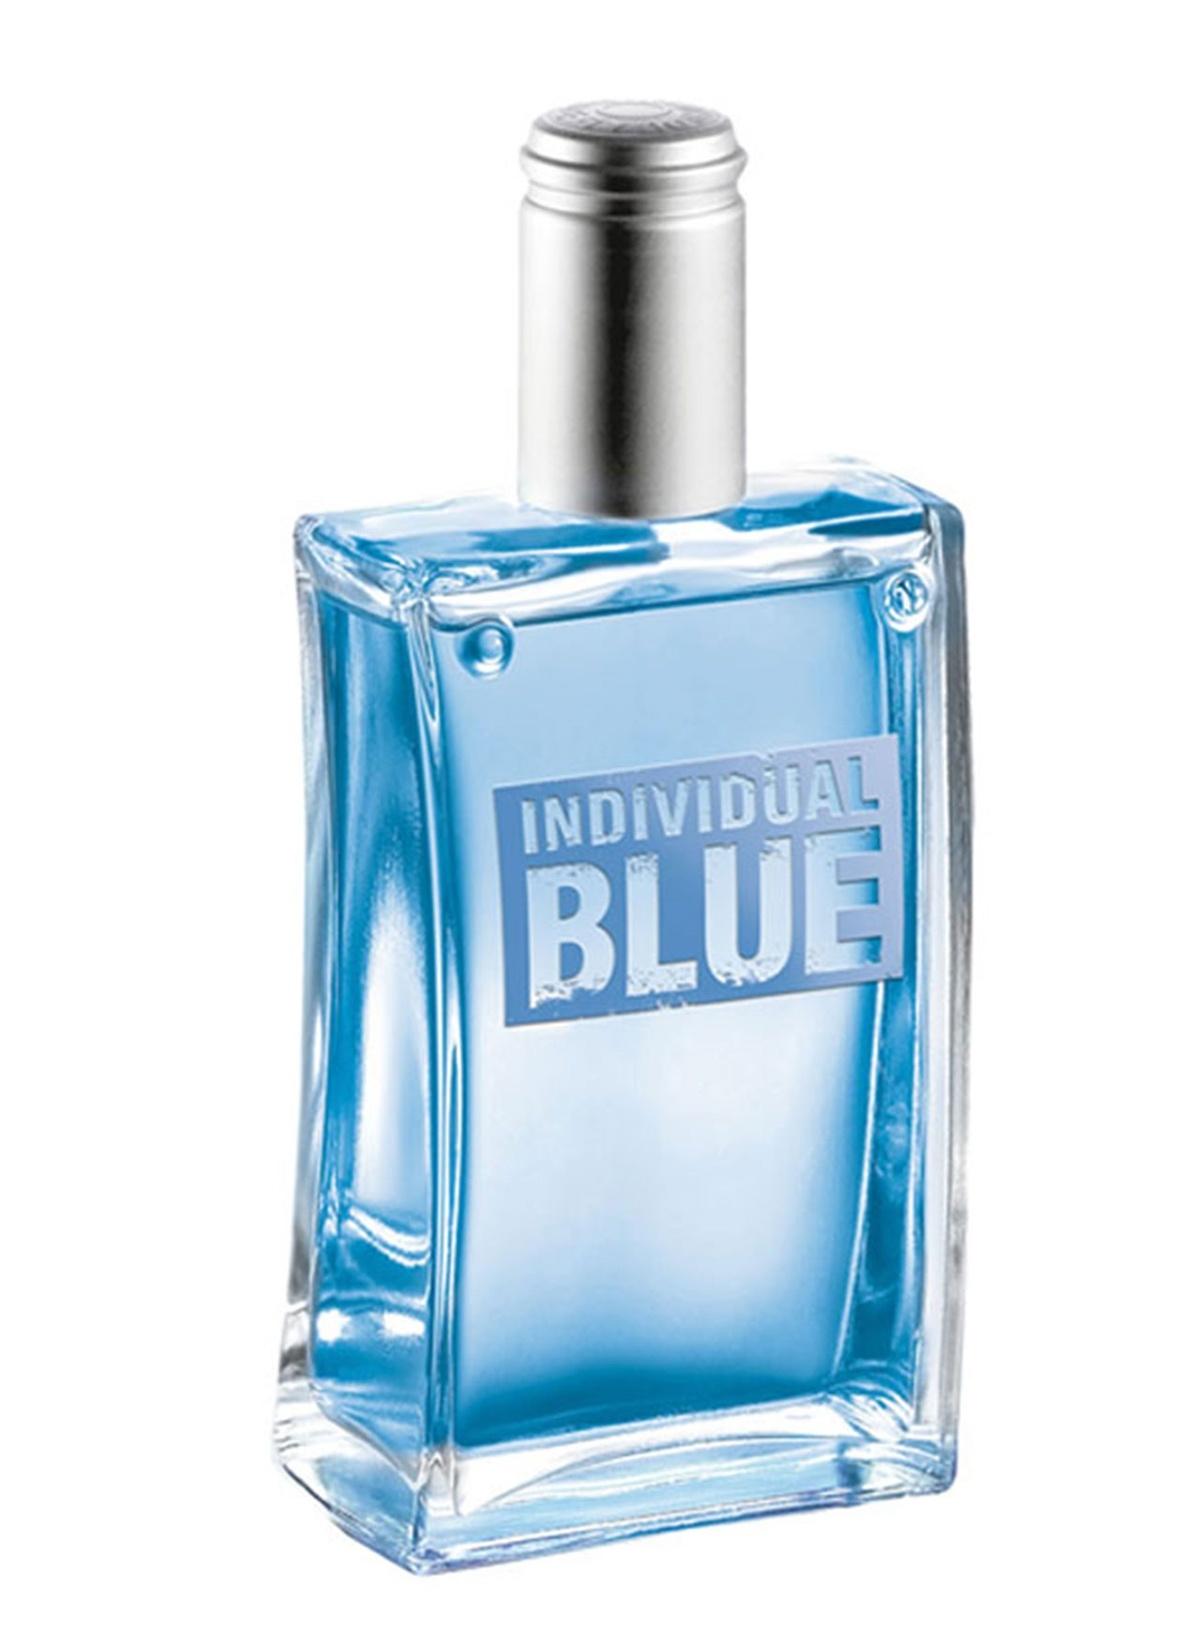 Individual blue косметика agor купить